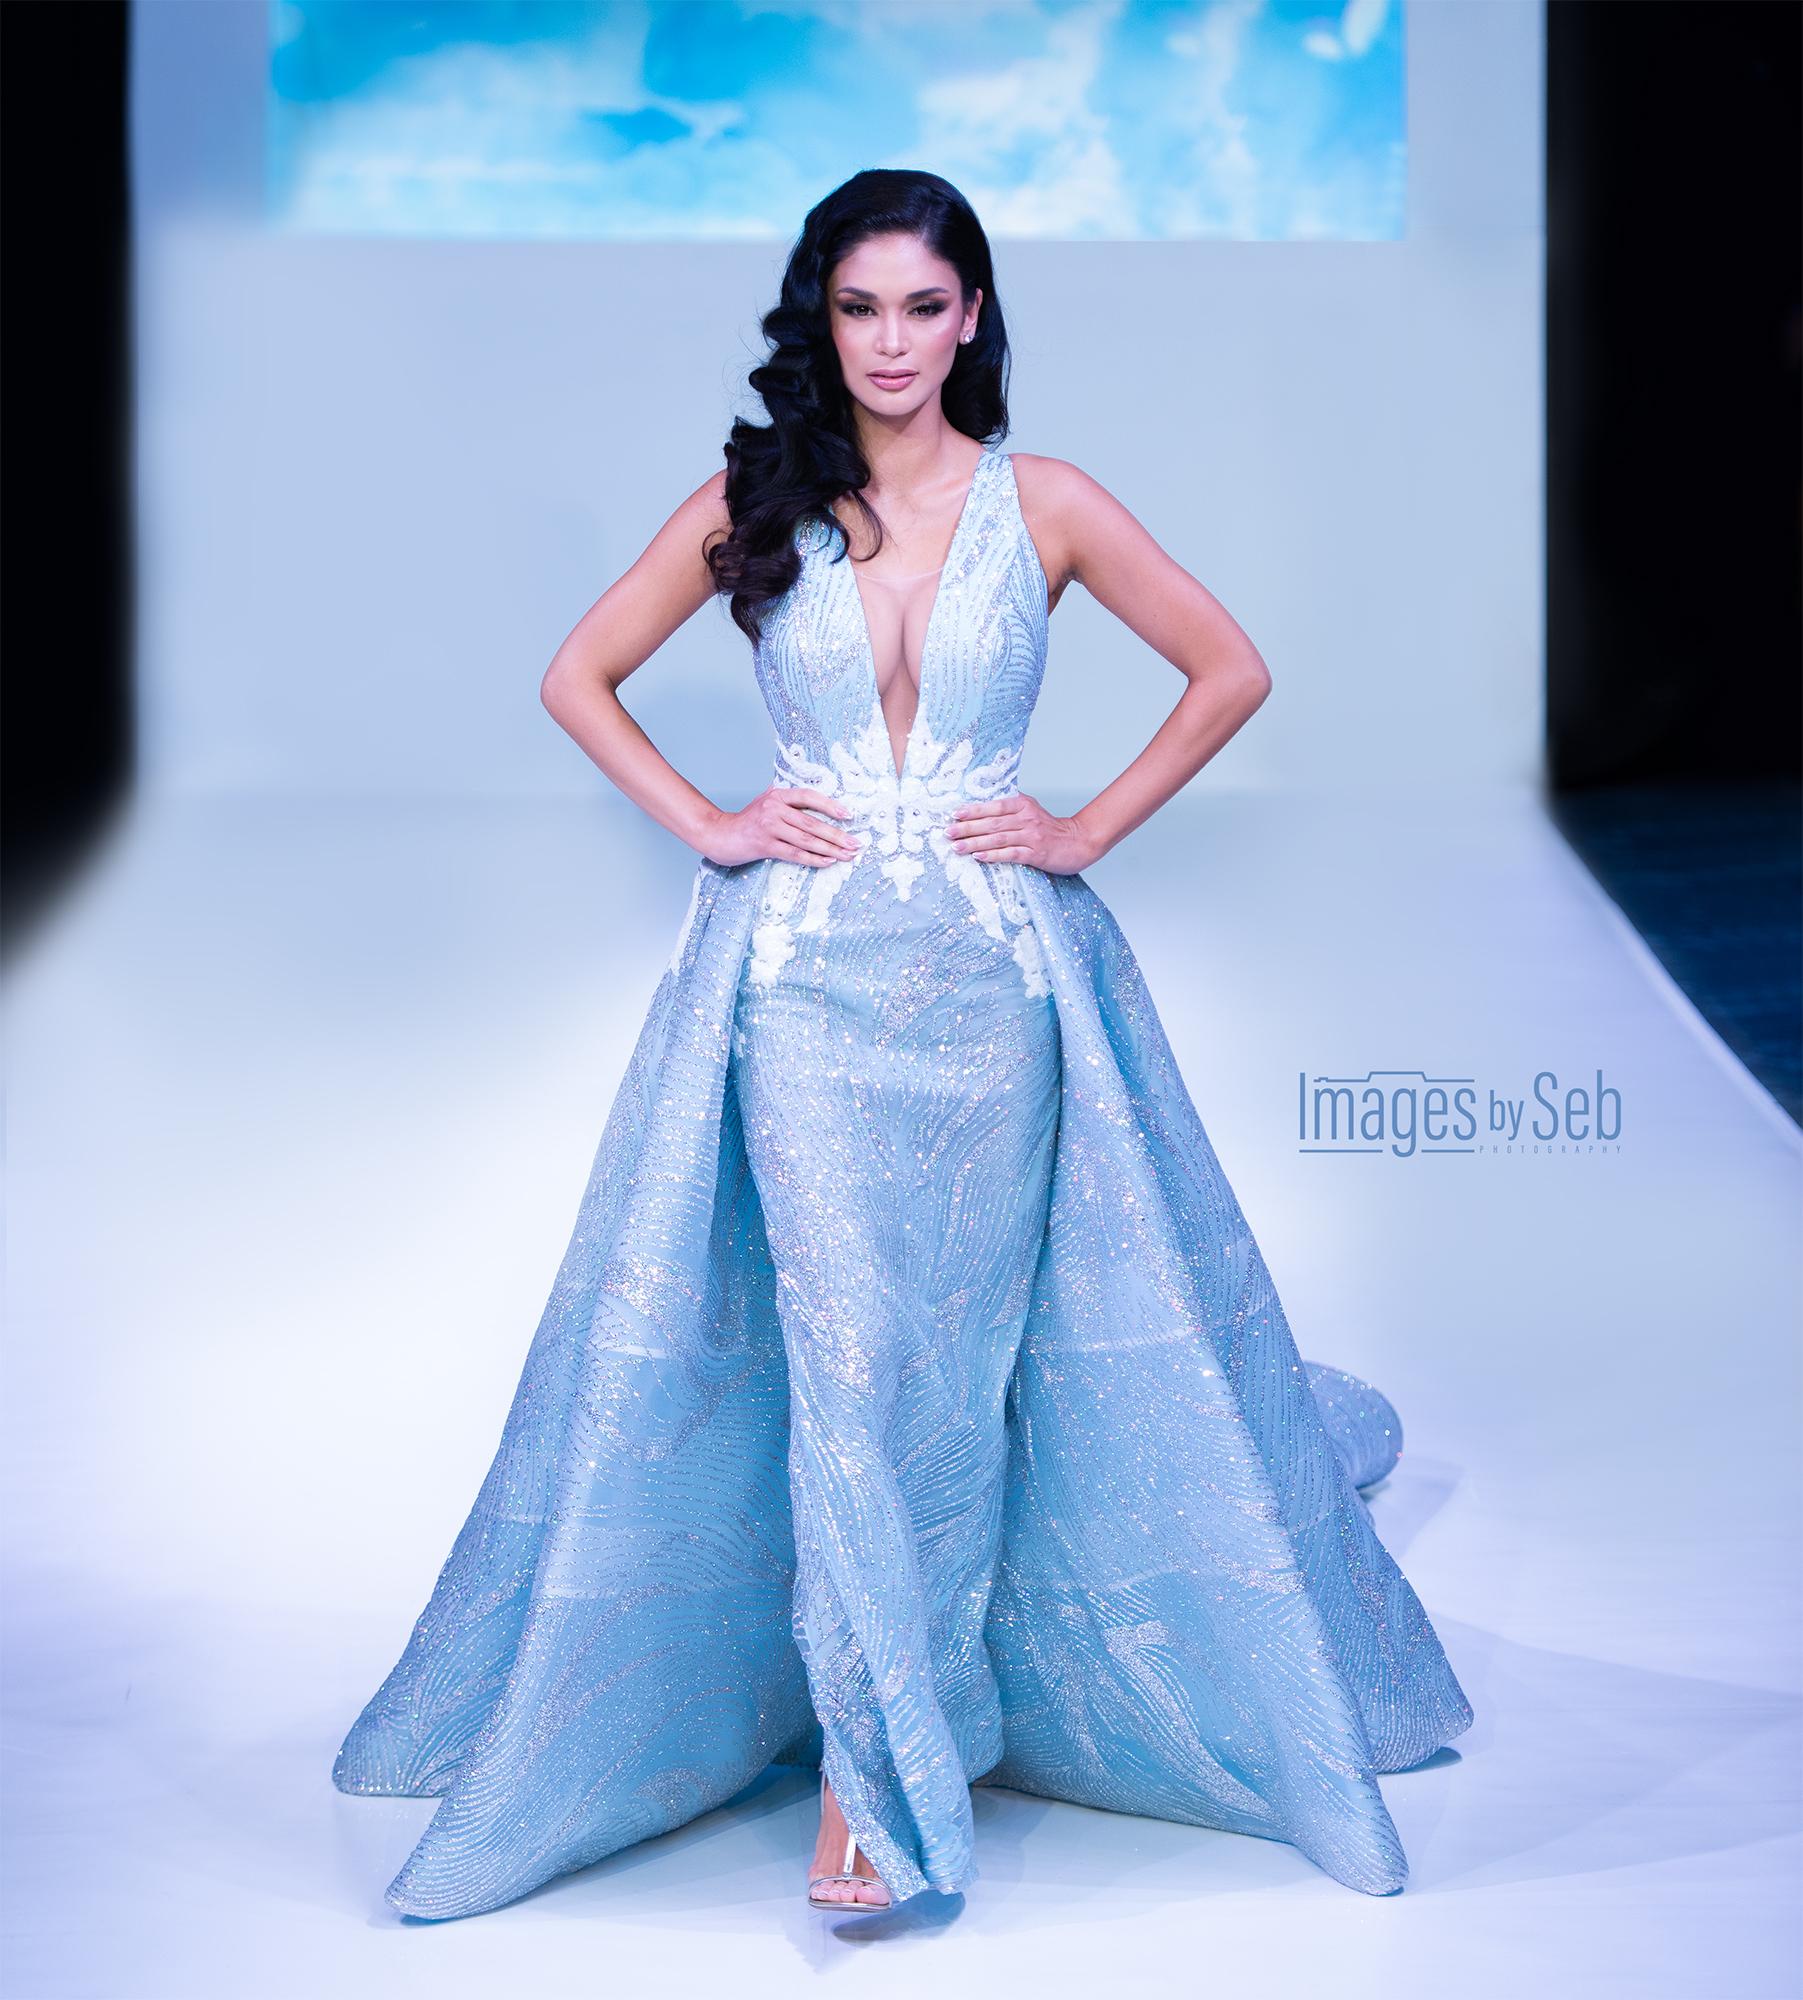 Pia Wurtzbach - Miss Universe